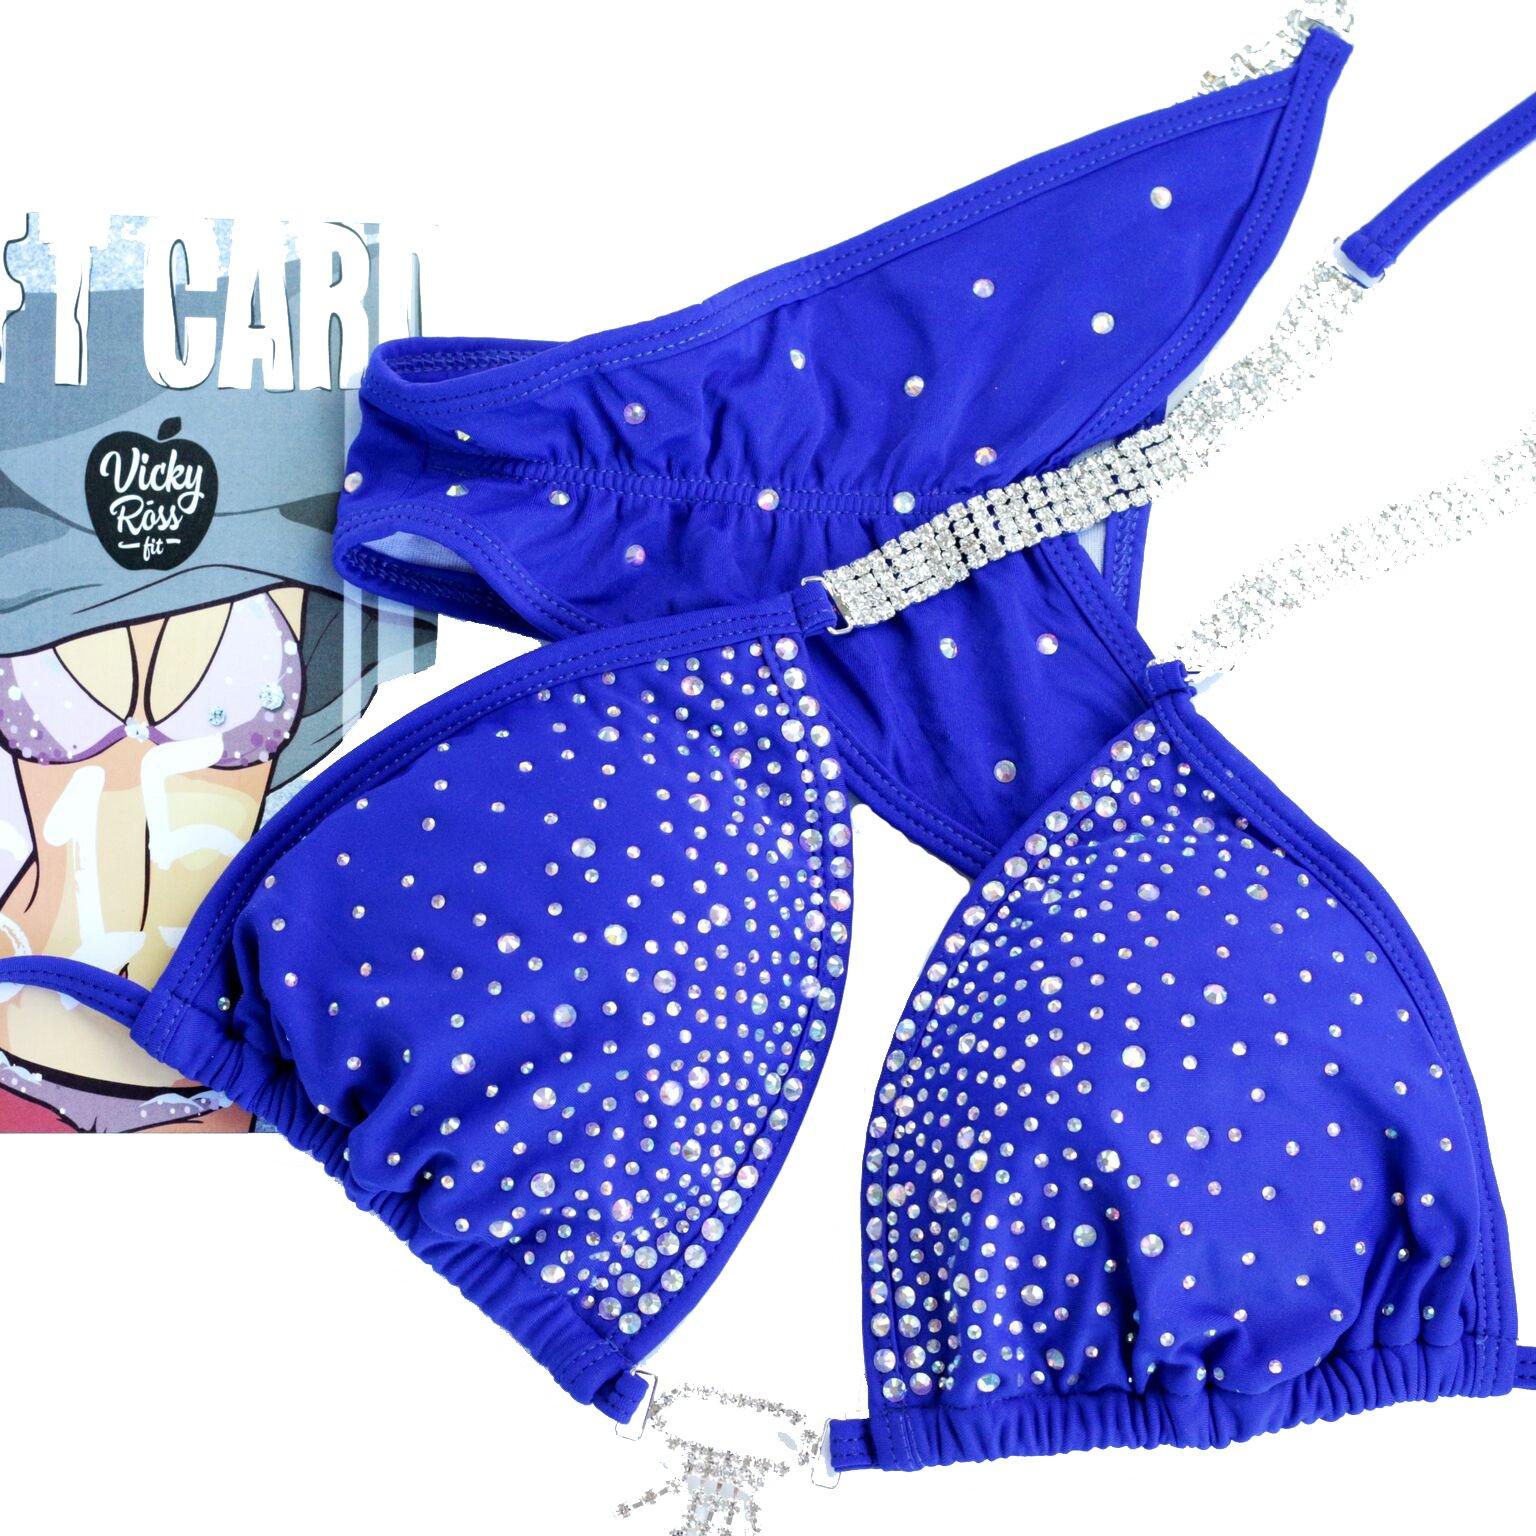 Pro Handmade Designer Competition Bikini Suit For Women   NPC IFBB Crystal Quick Ship Posing Suit   Brazilian Scrunch Bikini   Sapphire Blue (A-B-C/Hips 34''-37'', Sapphire Blue)